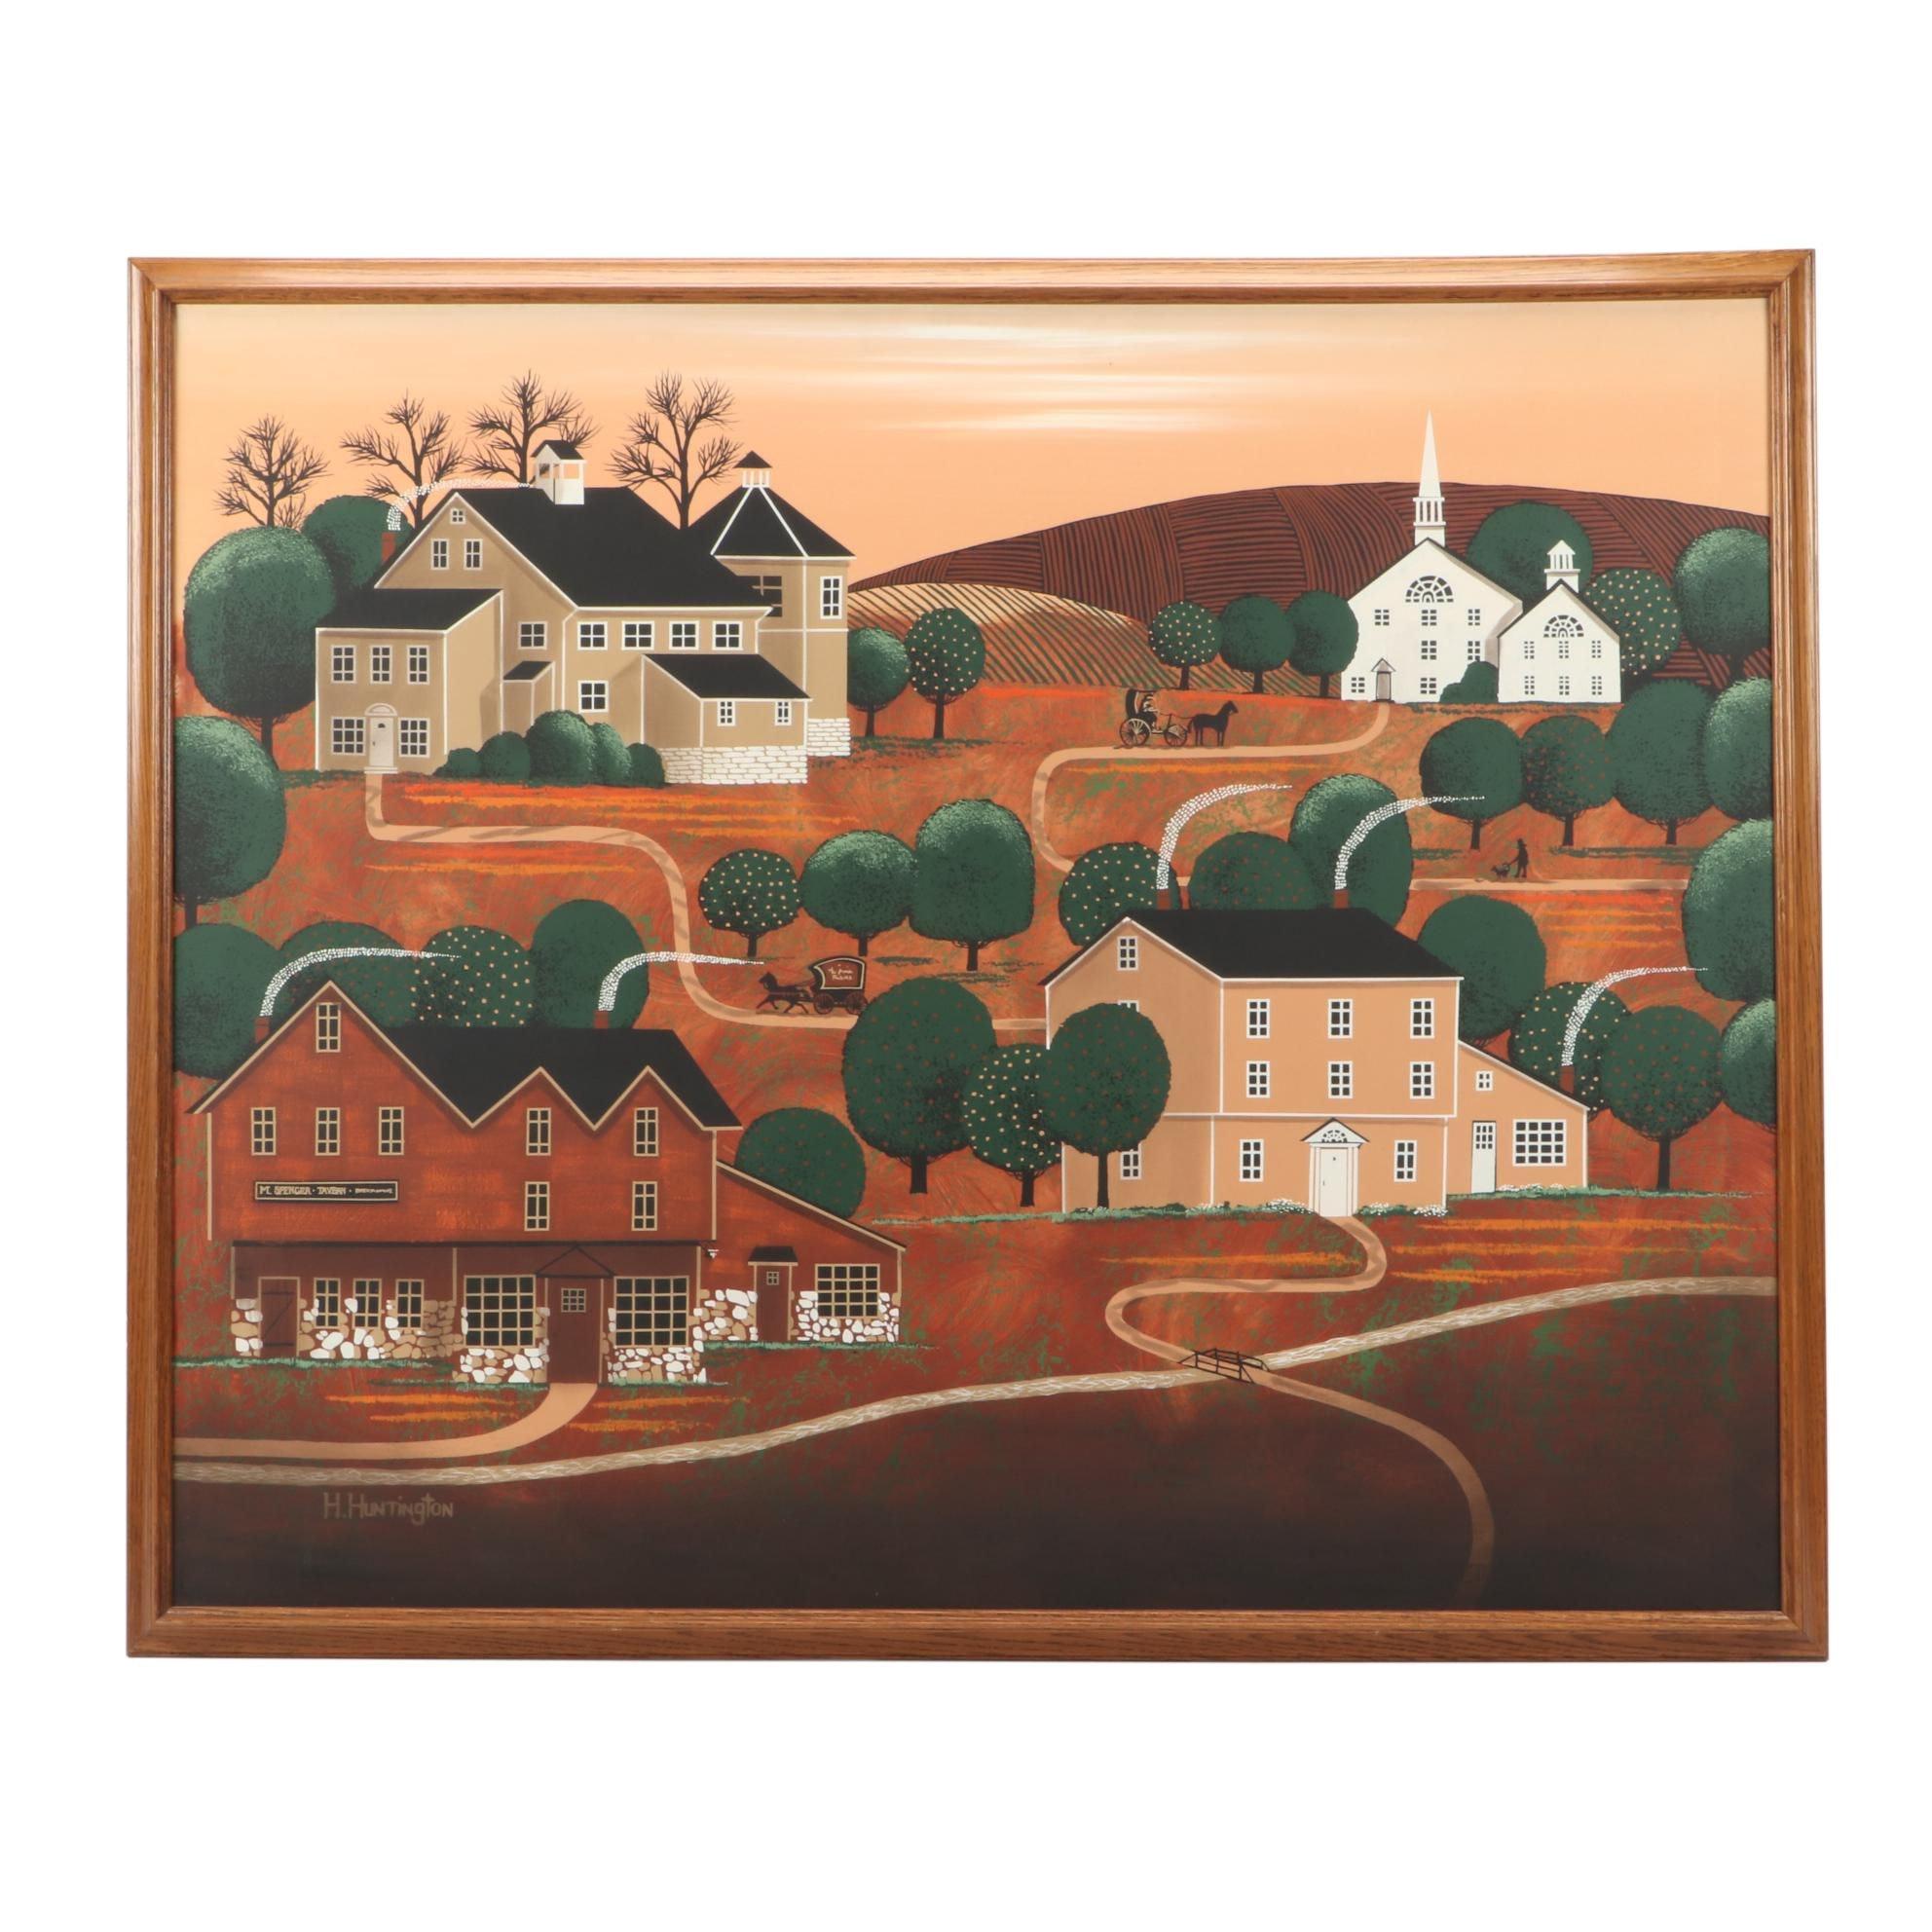 H. Huntington Folk Art Oil Painting